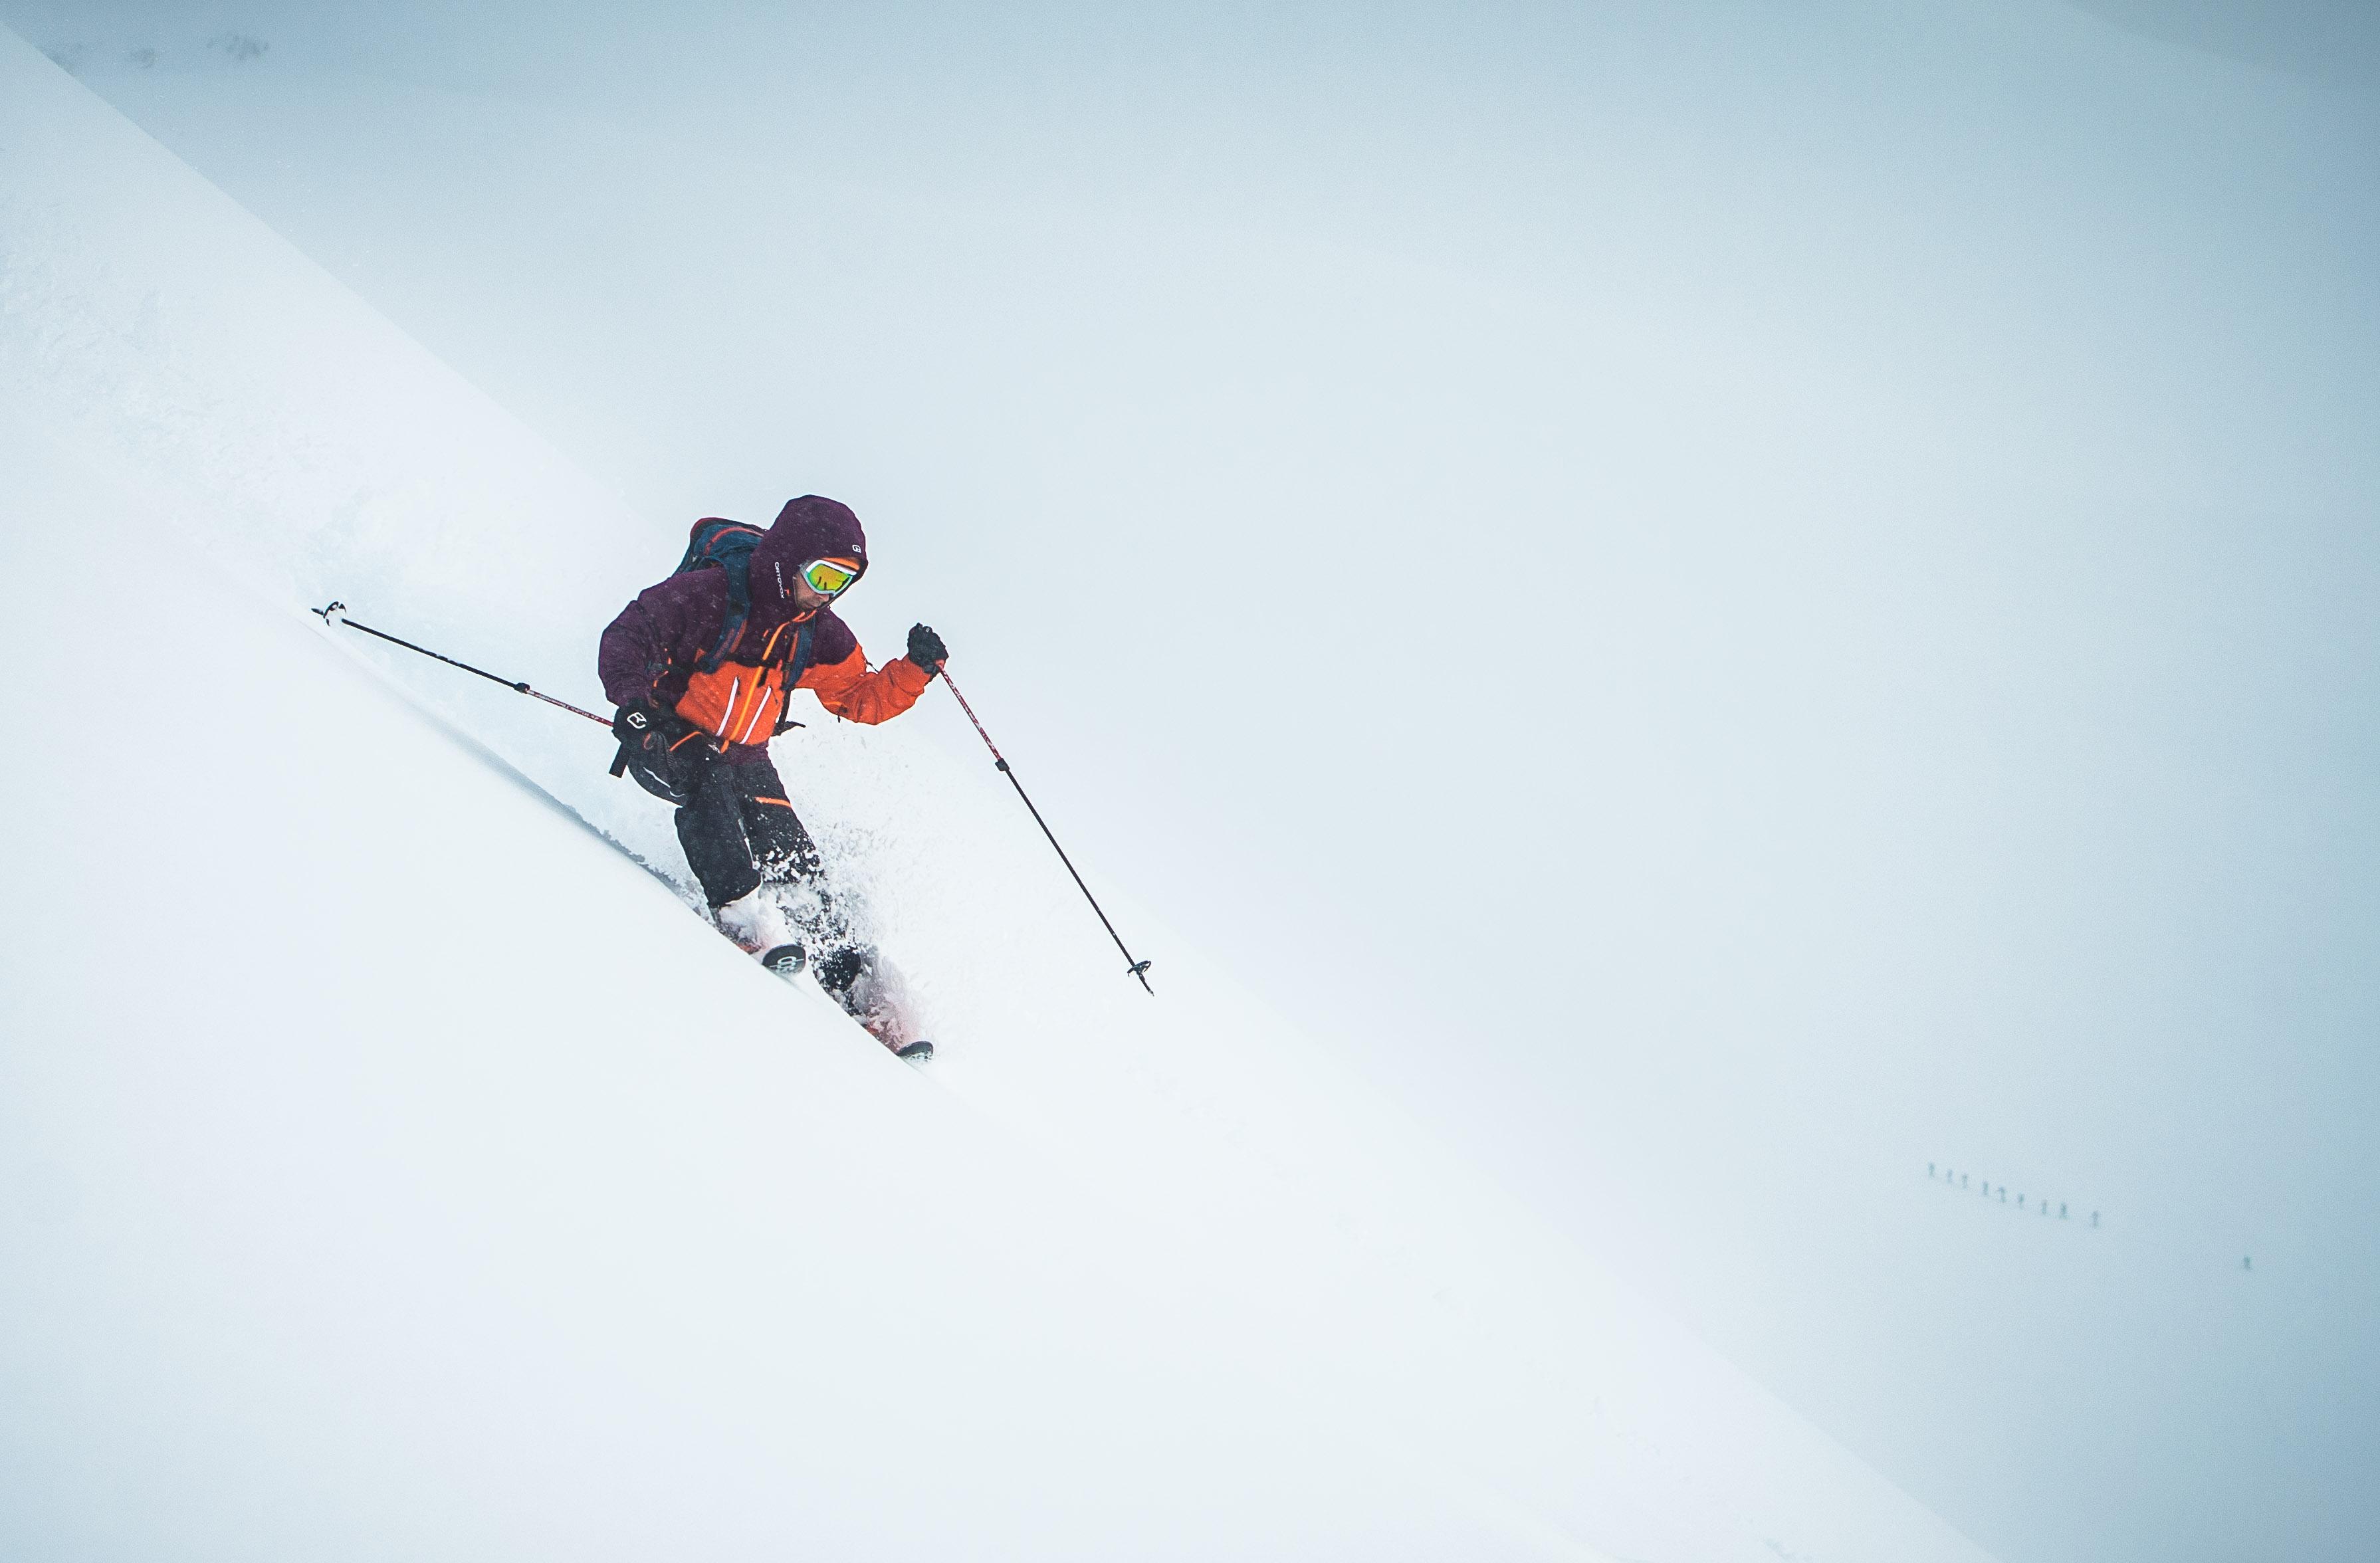 DPS Wailer 99 Ski, Dynafit TLT Speed Radical Bindings